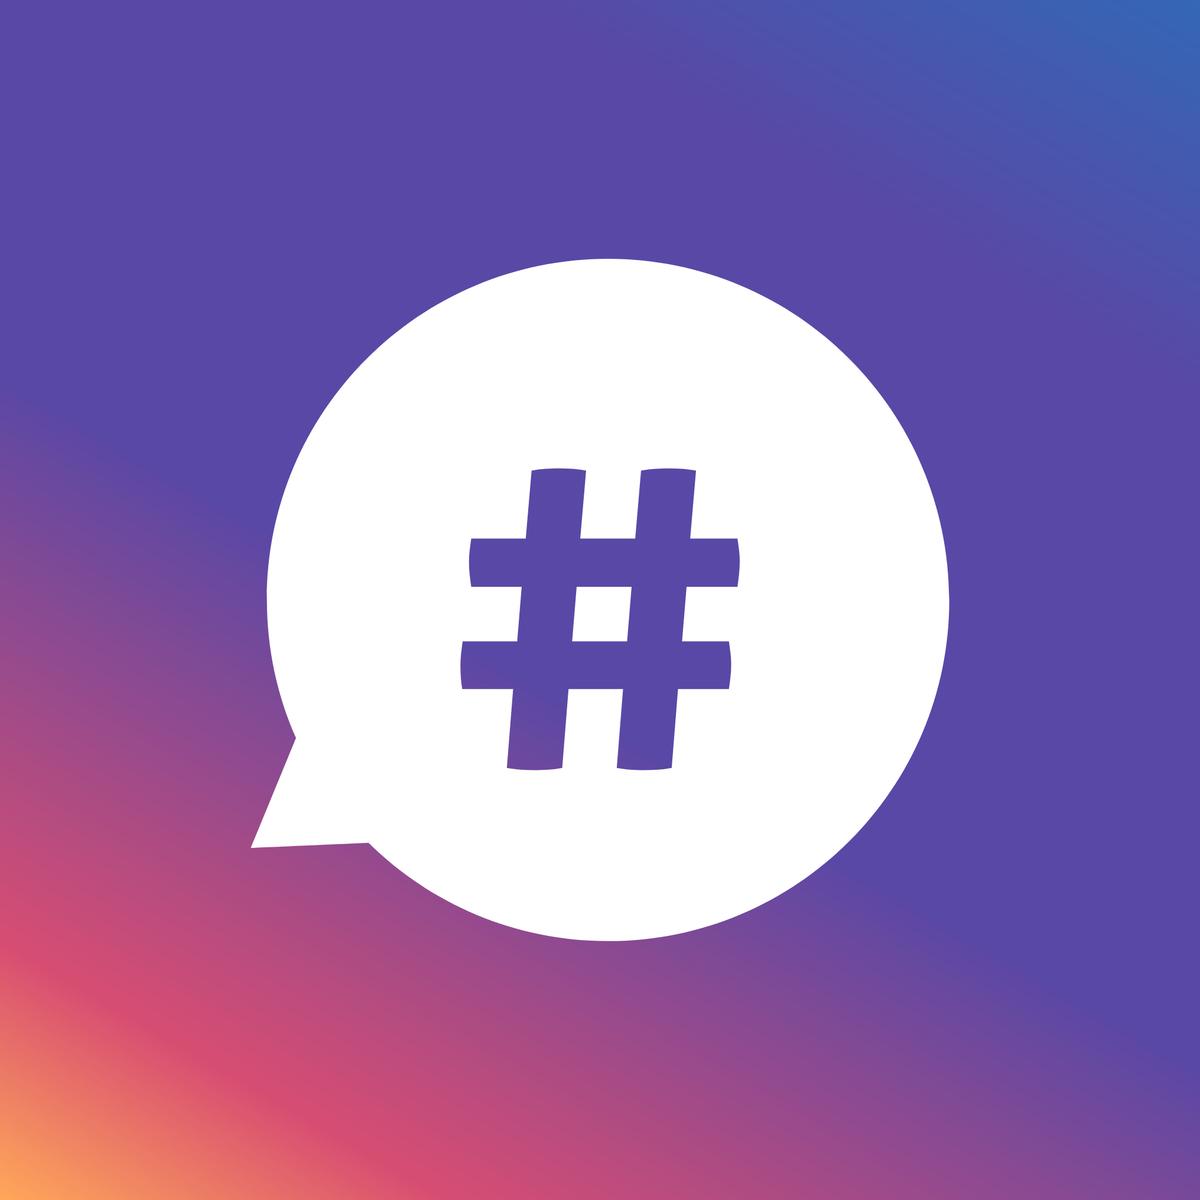 Use of hashtags in Social Media: Instagram vs. Facebook